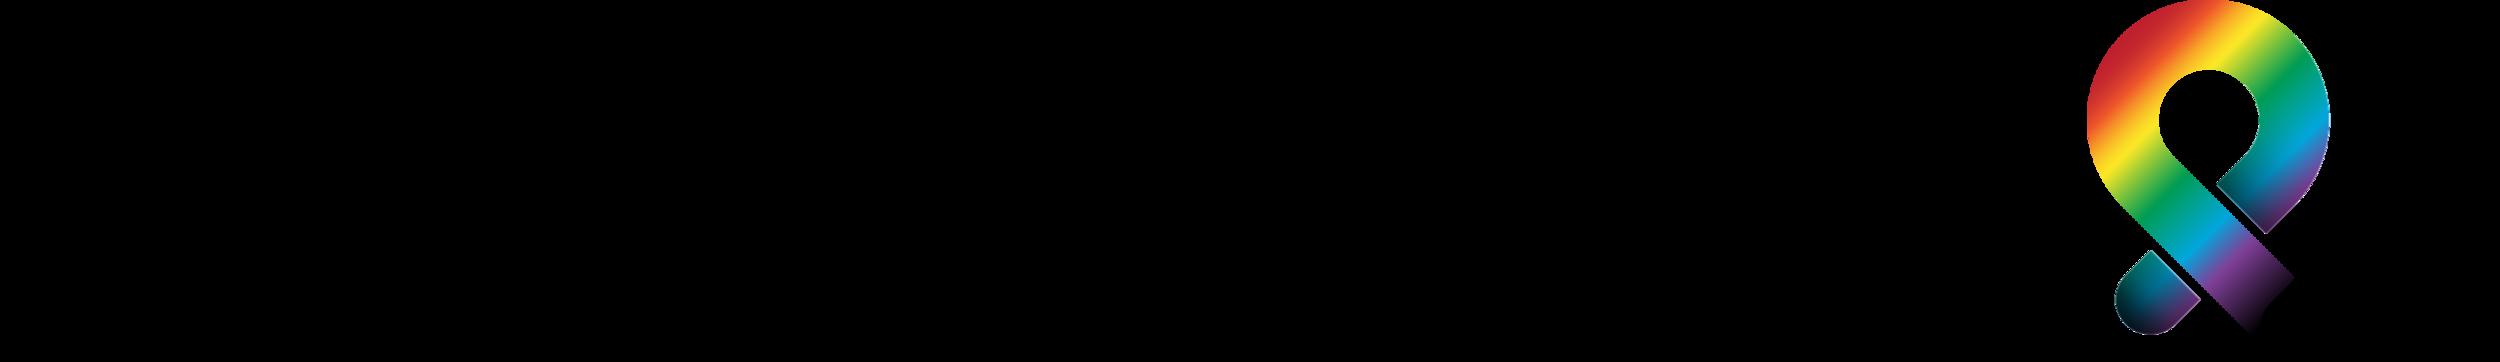 priderunto_PRF_logo_RGB_01.png